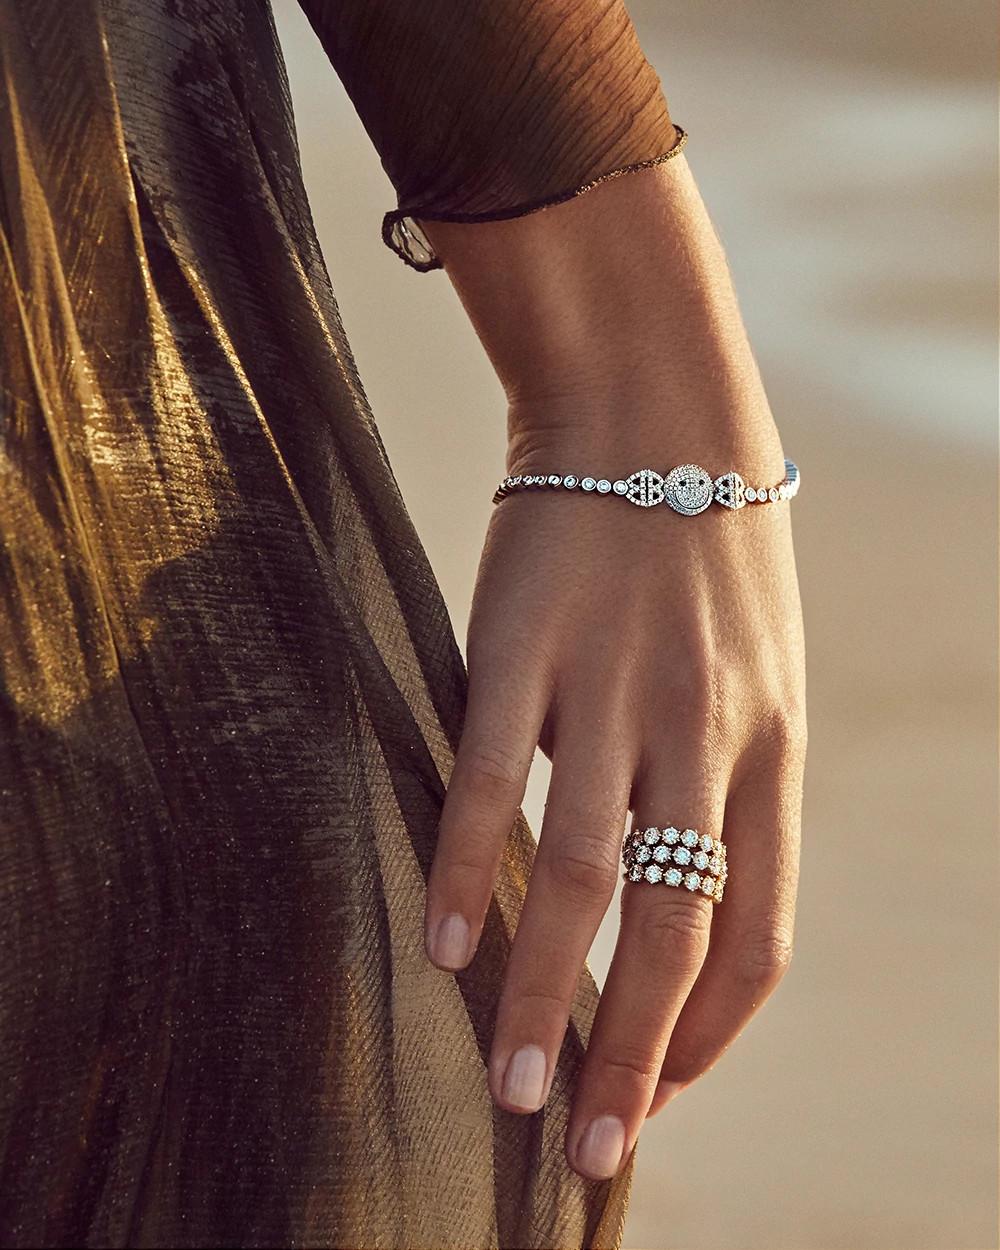 安娜佩戴Jade Trau Catherine Eternity No. 3 天然钻石戒指